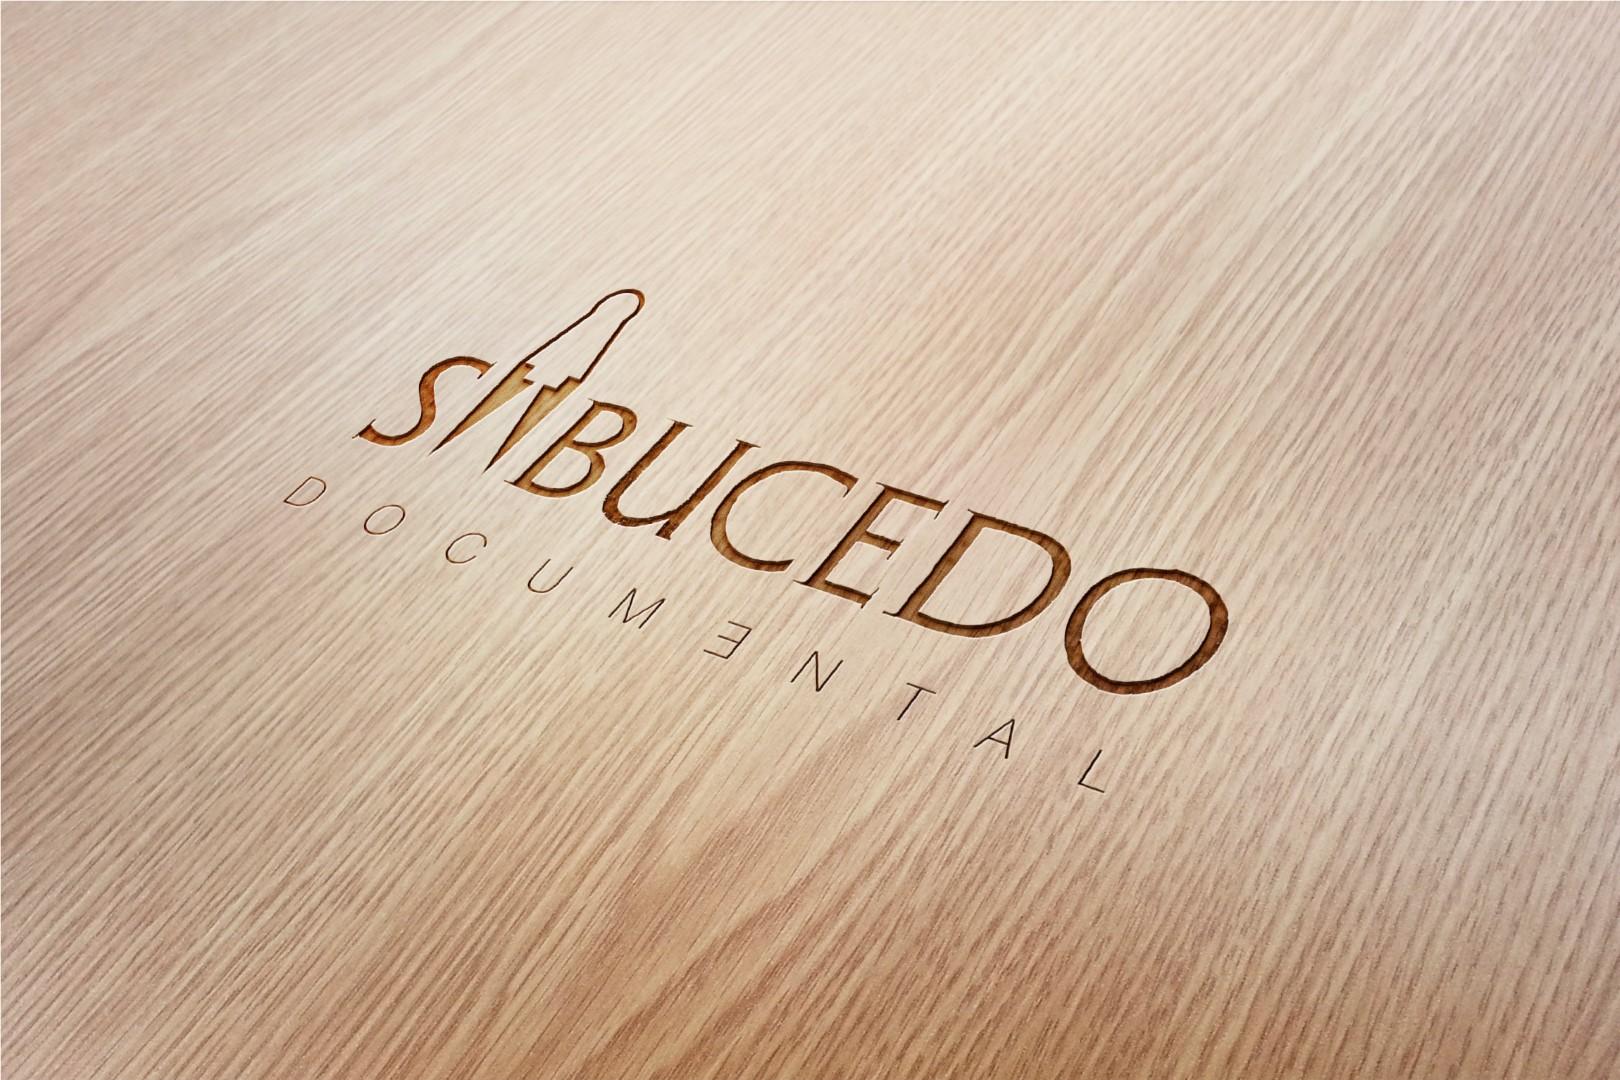 Sabucedo - 4BajoCero